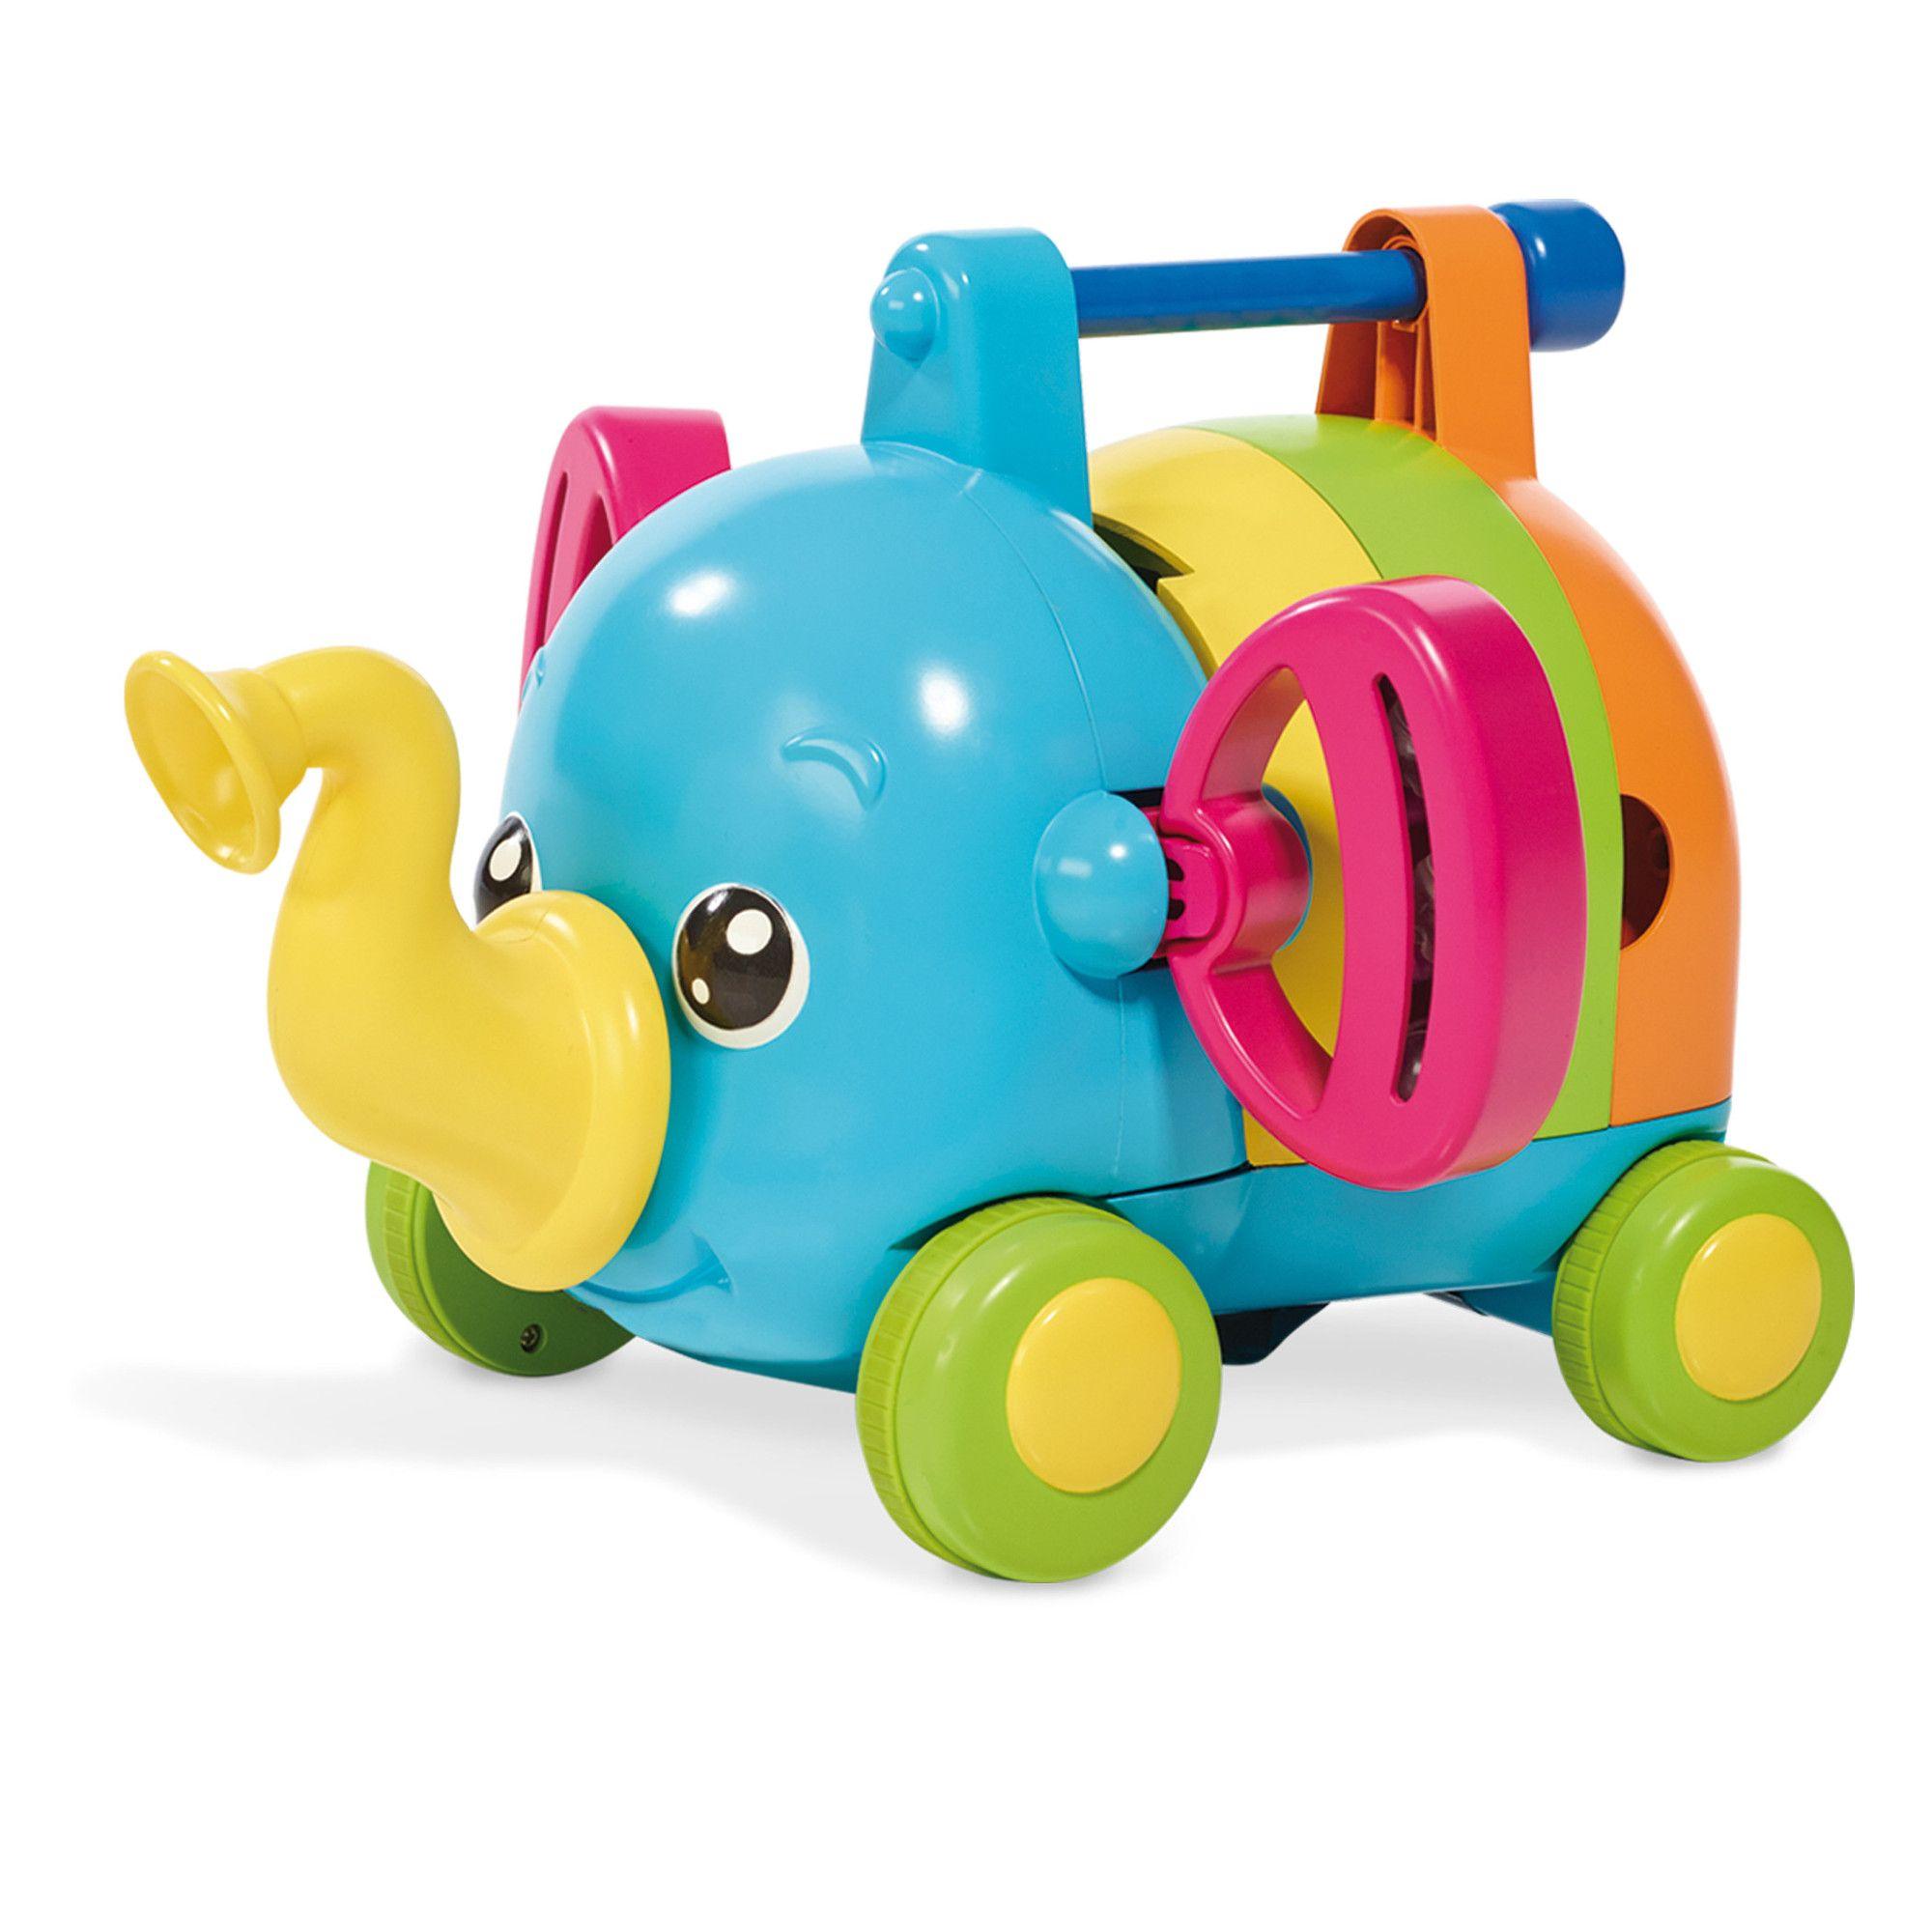 Tomy игр. Каталка-трансформер с муз.инстр.Слоненок-Оркестр,24х29х21см,кор. (арт. ТО72377)Игрушки для малышей до 3 лет<br><br><br>Артикул: ТО72377<br>Бренд: Tomy<br>Категории: Машинки для малышей